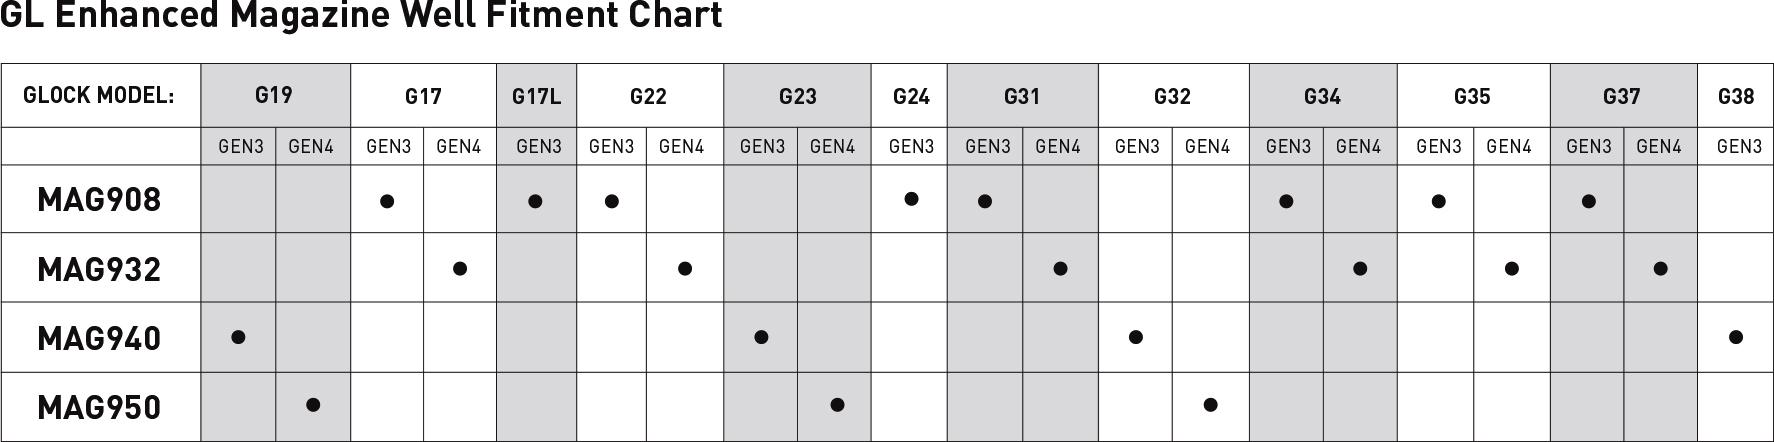 Magpul Glock Magwell Fitment Chart